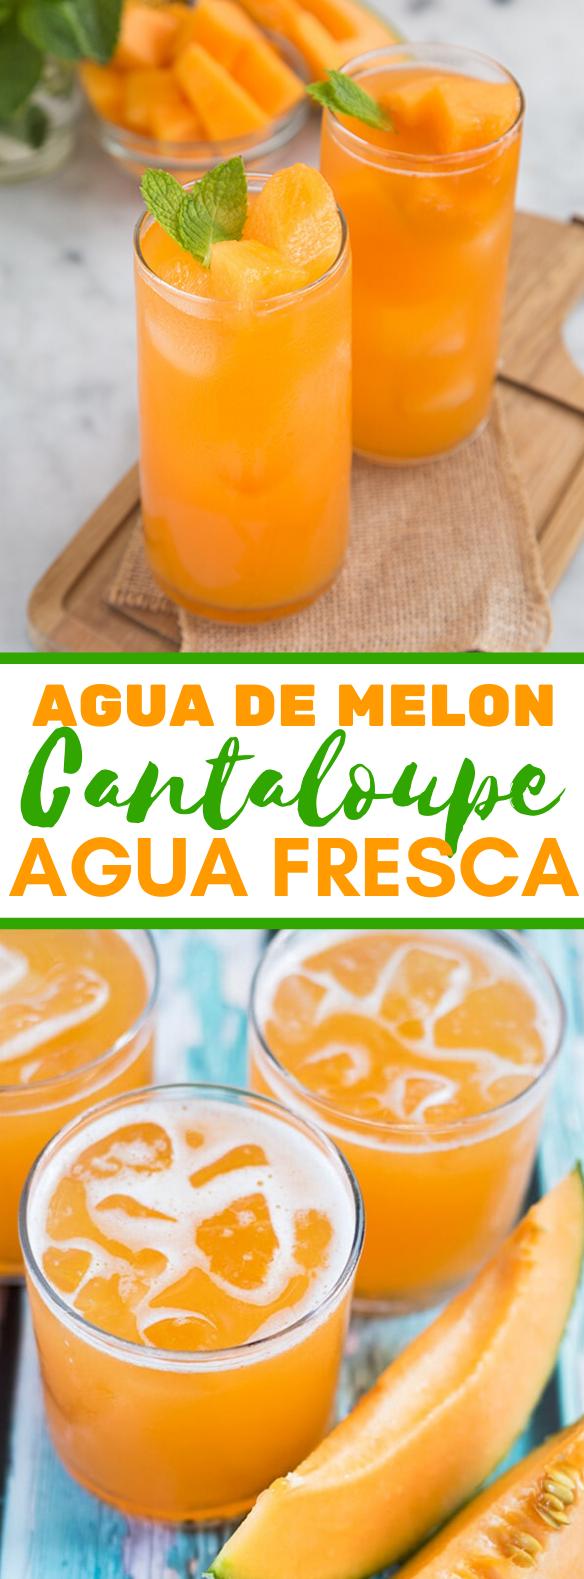 CANTALOUPE AGUA FRESCA/AGUA DE MELON #drinks #fruit